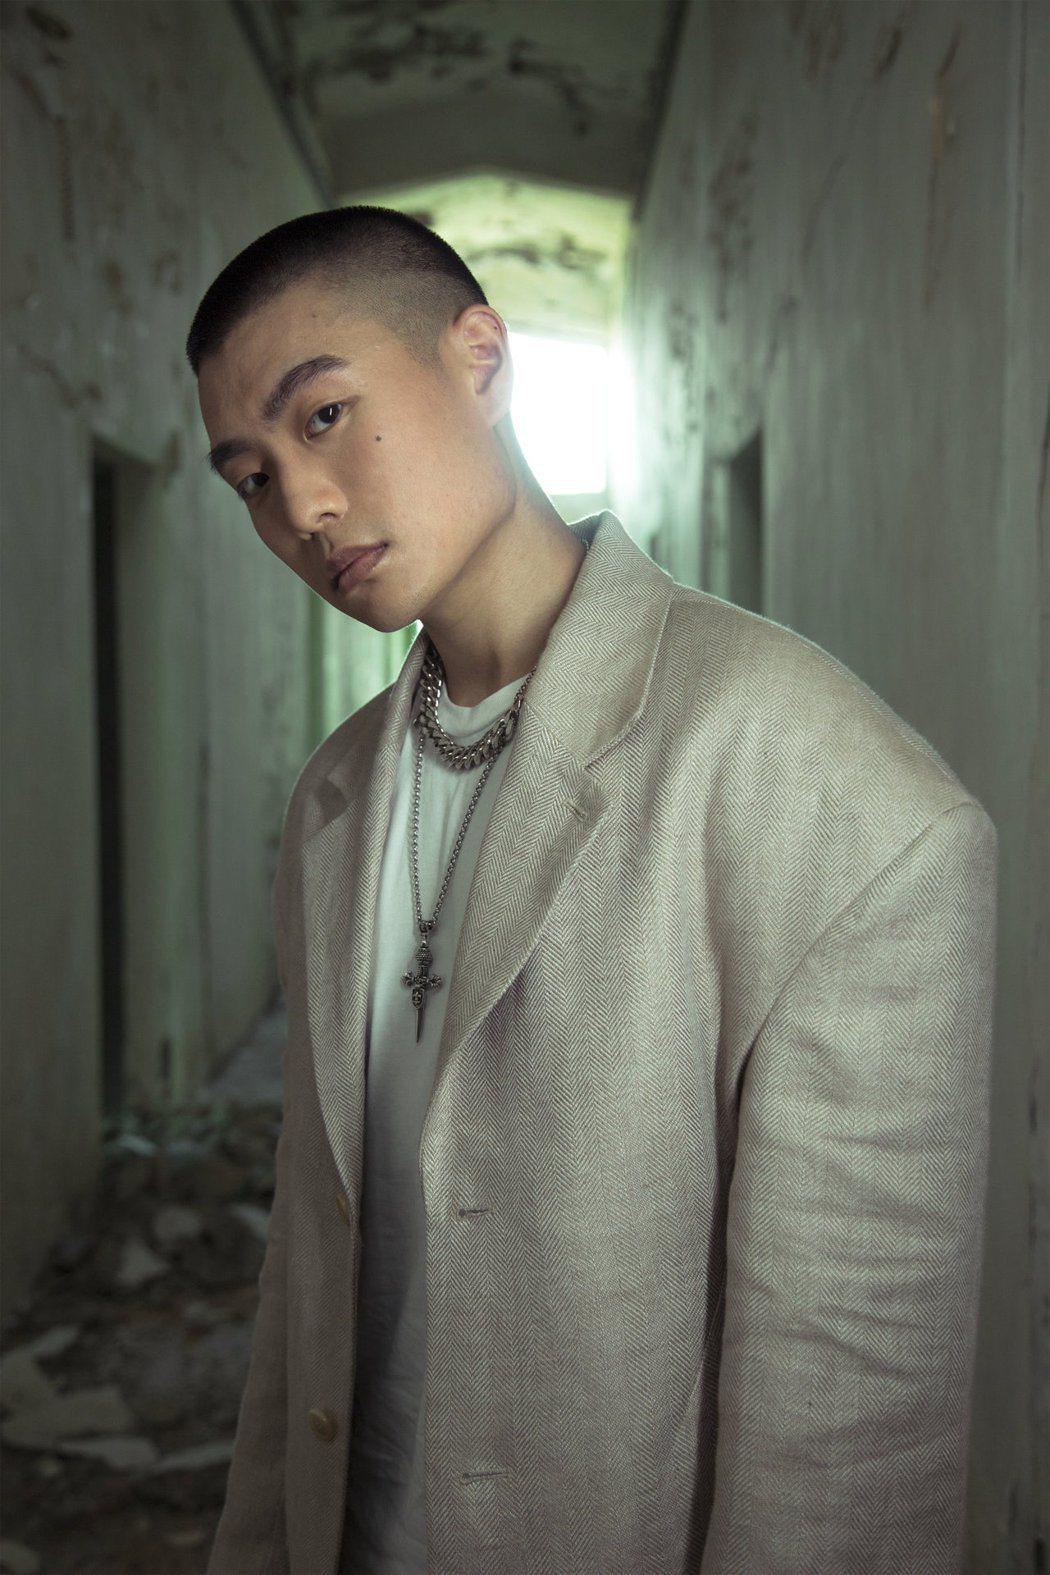 創作新人LEE推出新歌「Old Fashion Luv」。圖/環球音樂提供